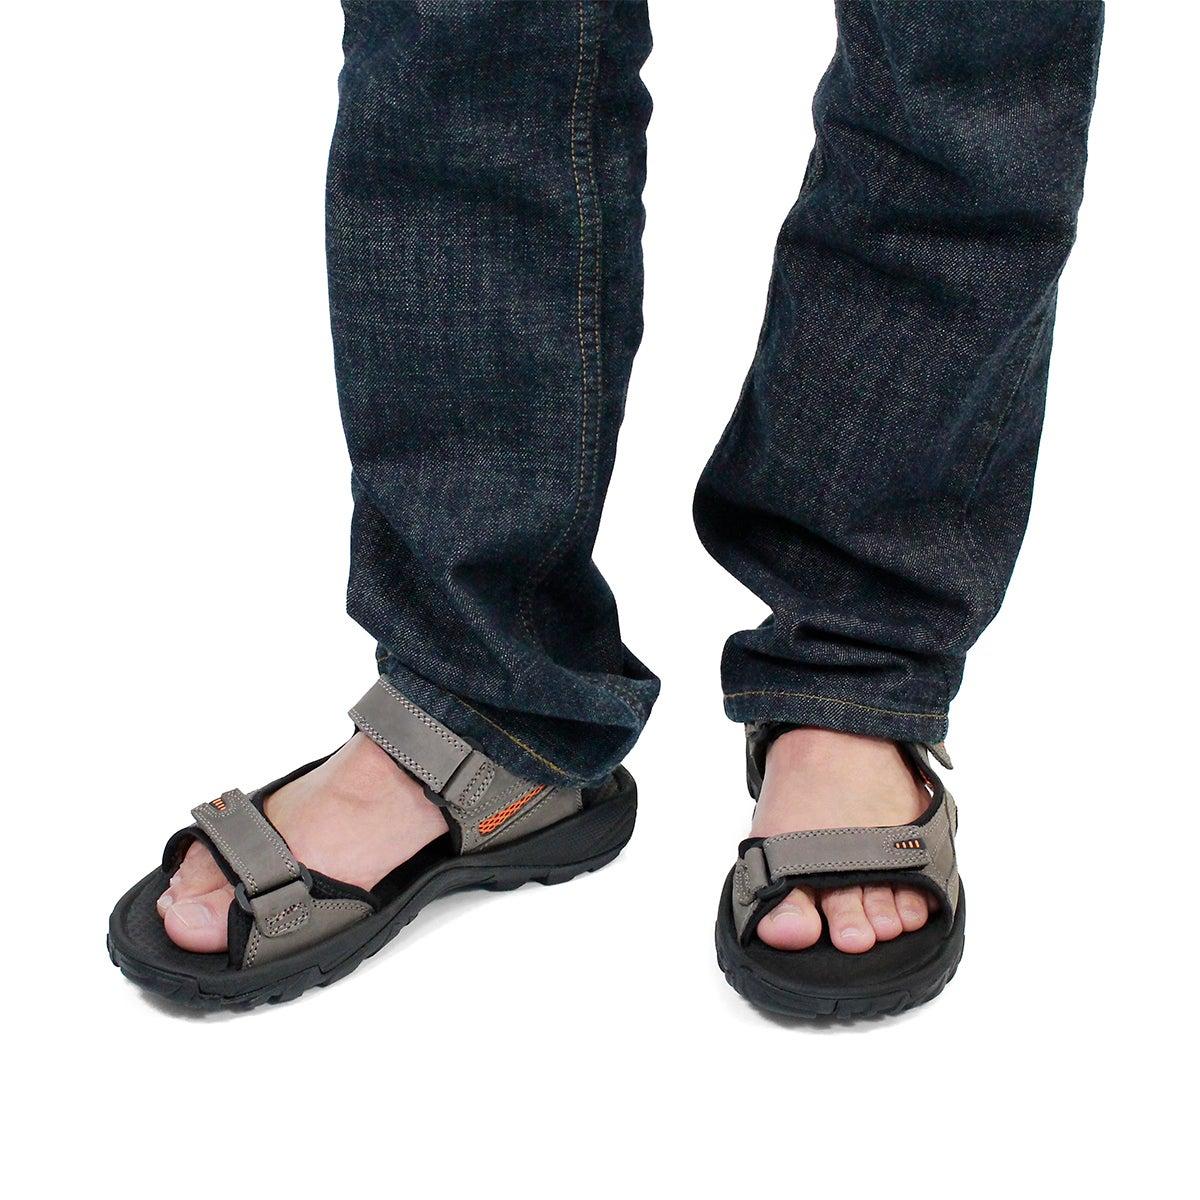 Mns Lucius 2 grey 3 strap sandal